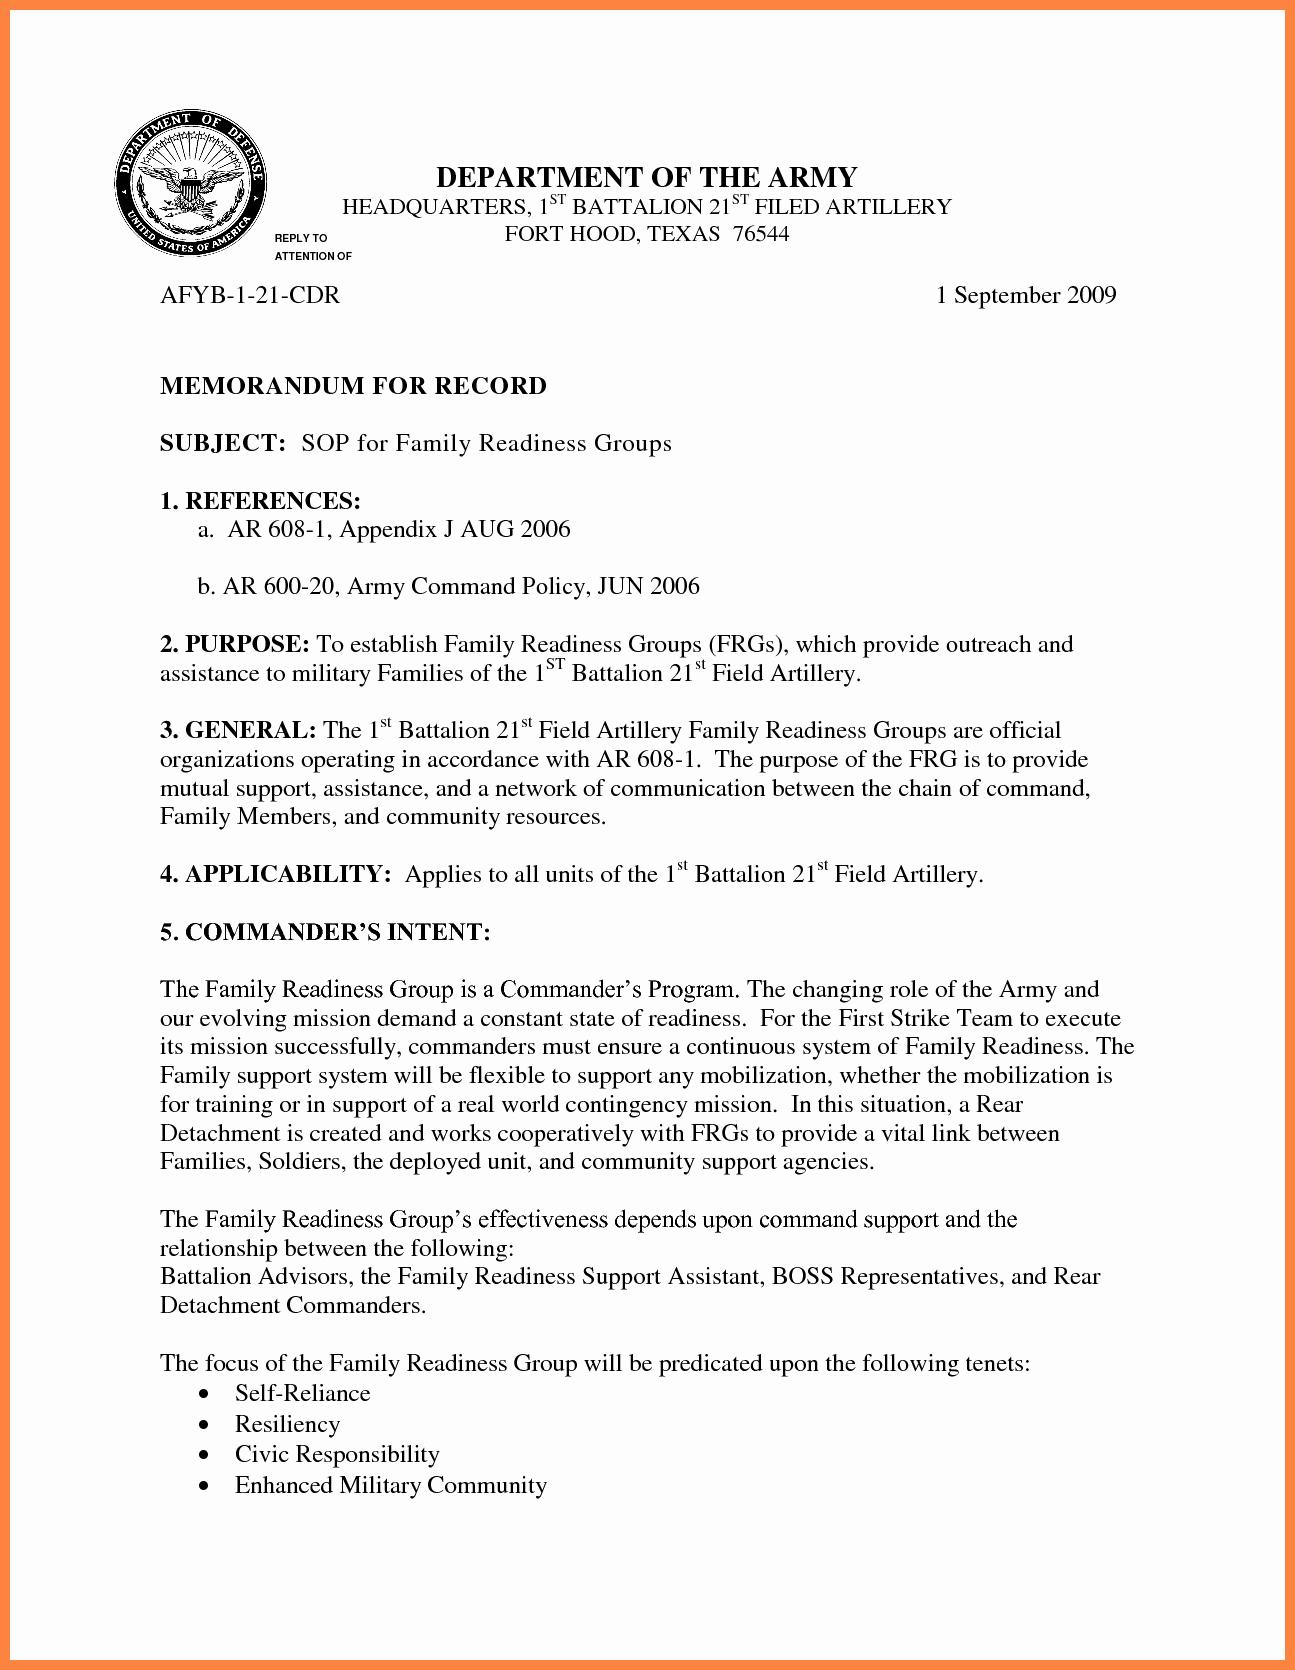 Memorandum Of Record Template Fresh 9 Memorandum for Record Army